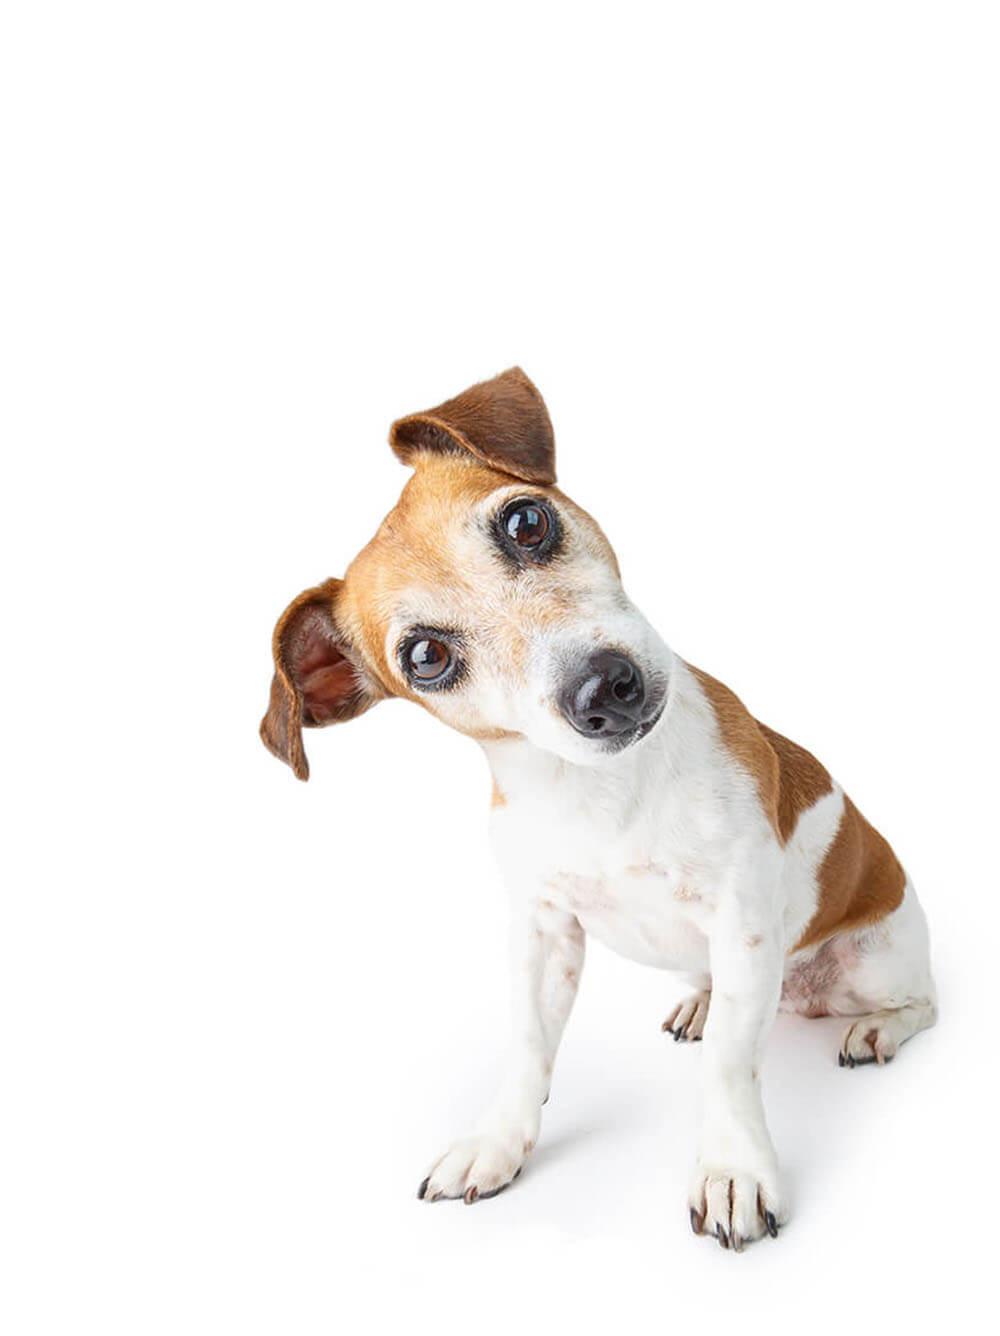 Dog with head turned sideways white background